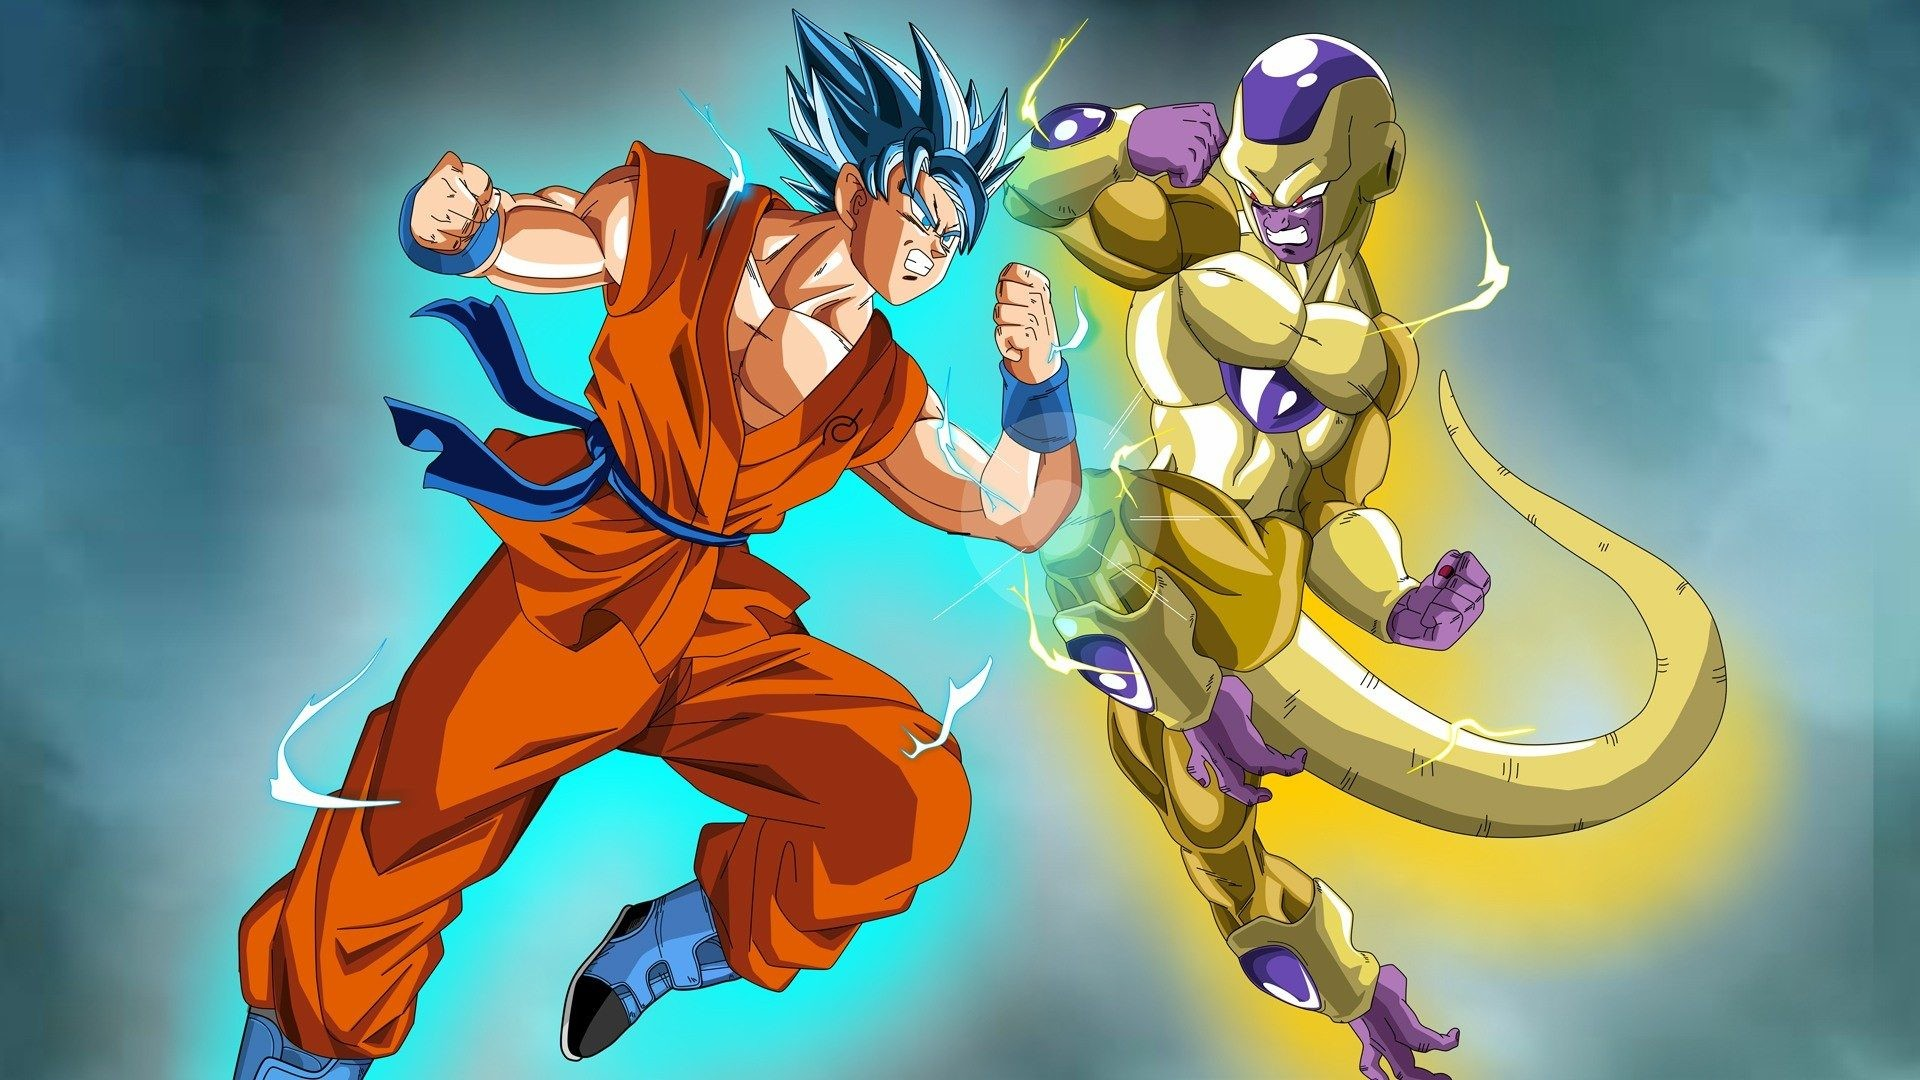 Res: 1920x1080, Super Saiyan Blue Goku Vs Frieza Wallpaper